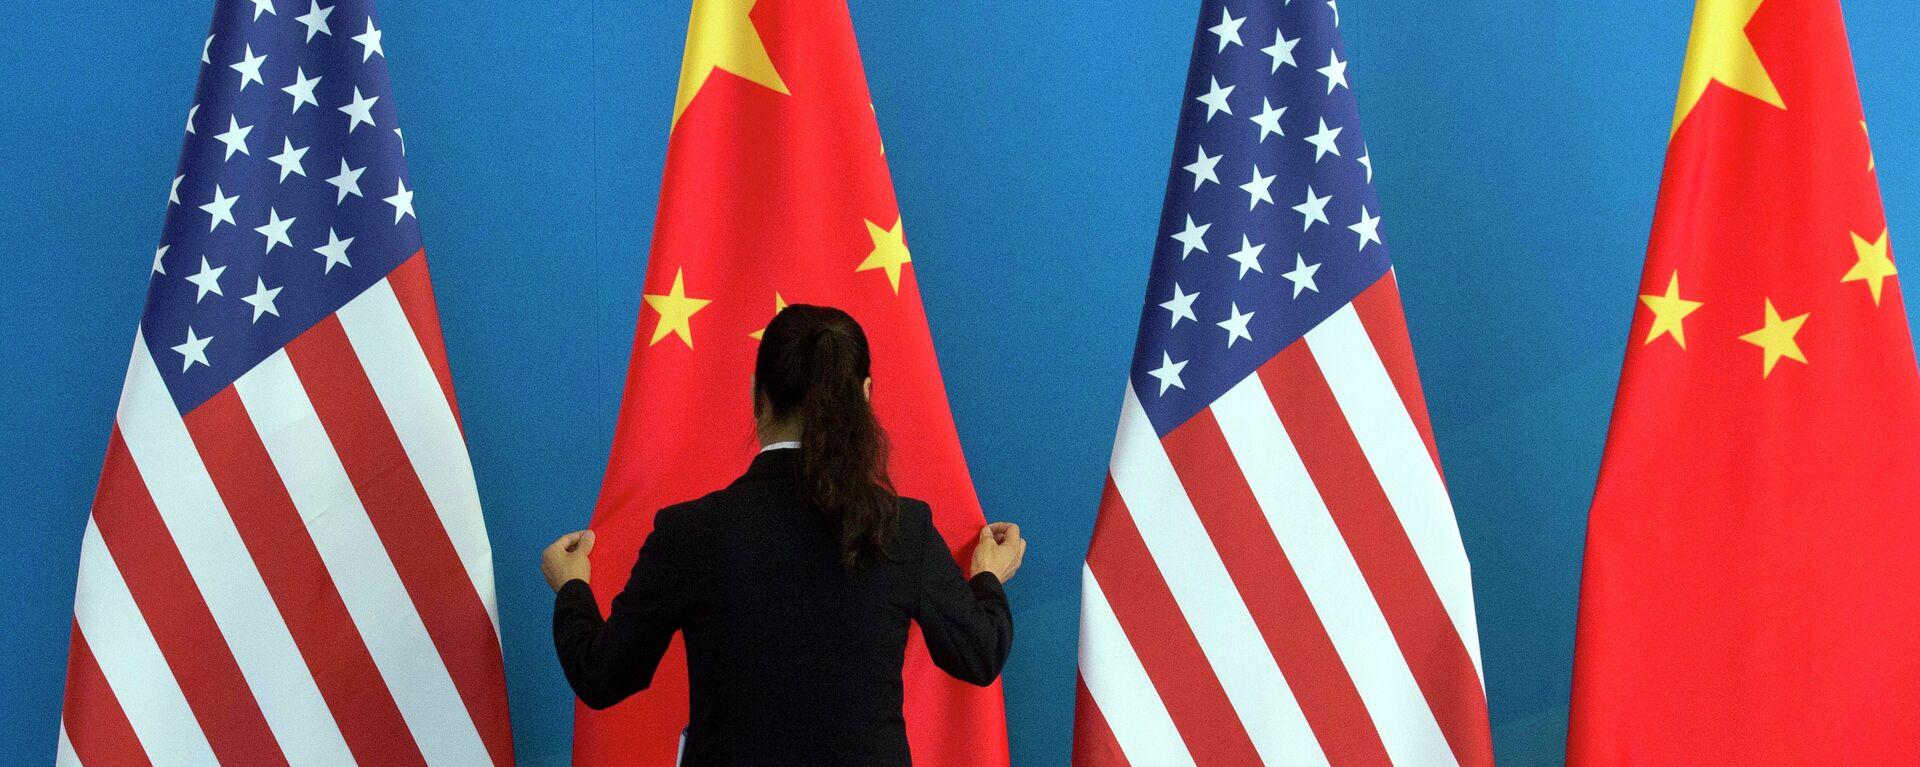 Bandiere Cina e USA - Sputnik Italia, 1920, 11.07.2021